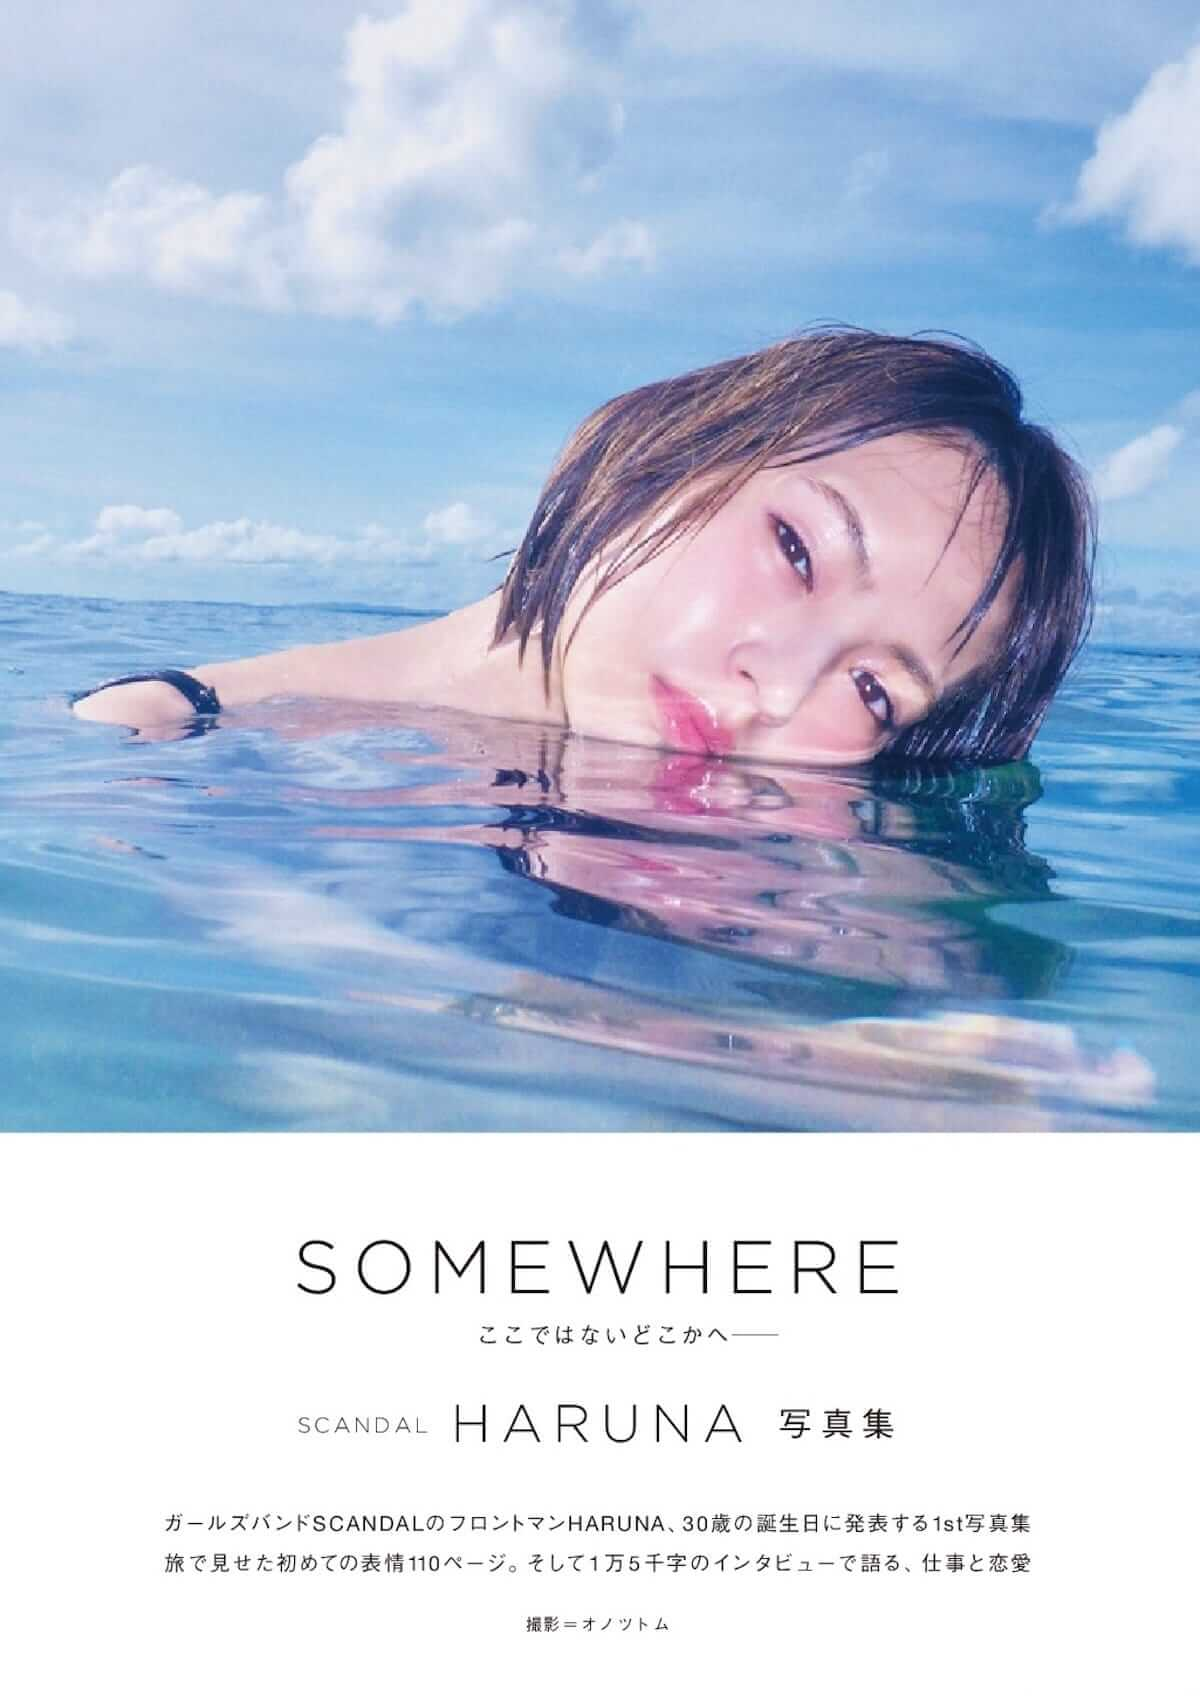 SCANDAL、HARUNAファースト写真集『SOMEWHERE』少女のような笑顔から大人の表情までを見せる! art180713_scandal-haruna_f-1200x1696